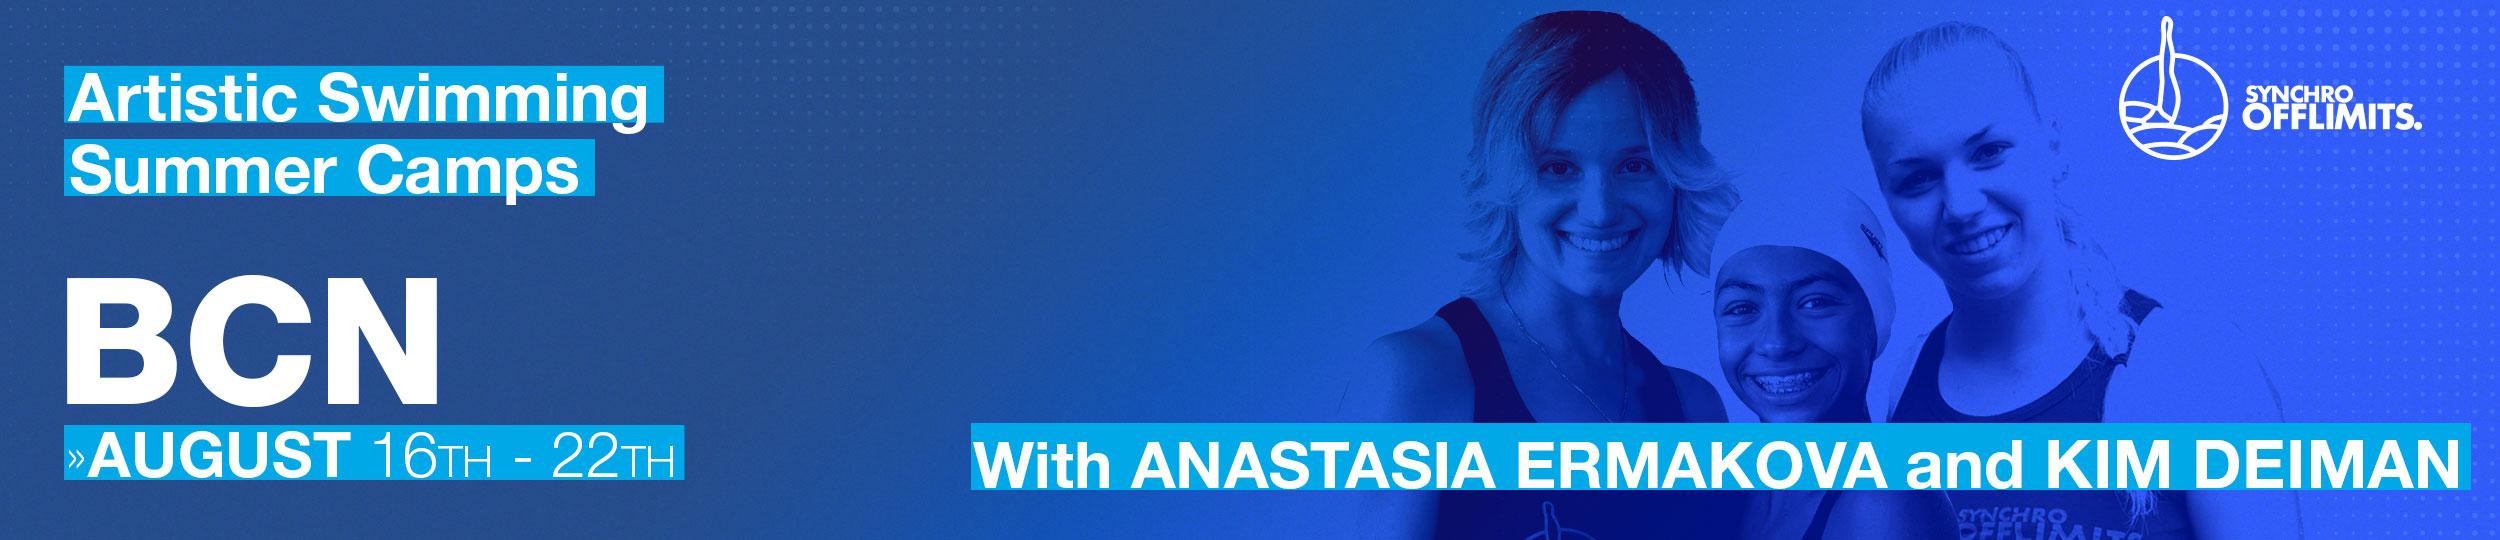 synchrocamps in barcleona 2020 august anastasia ermakova kim deiman